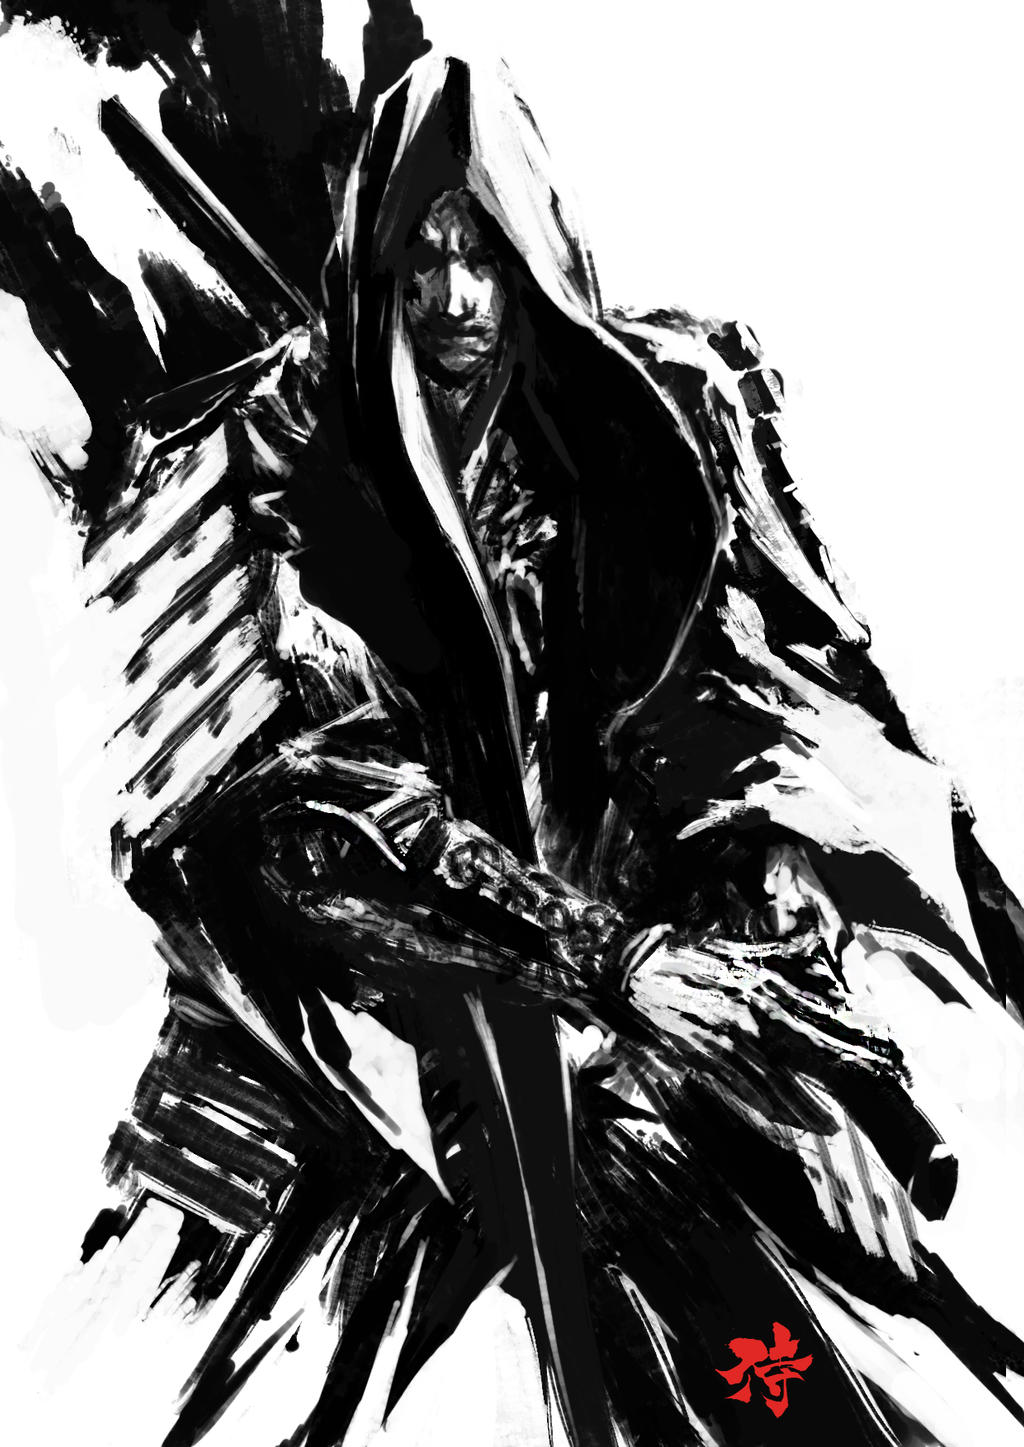 Subject: Samurai Spirit - A Detailed Review - BoardGameGeek